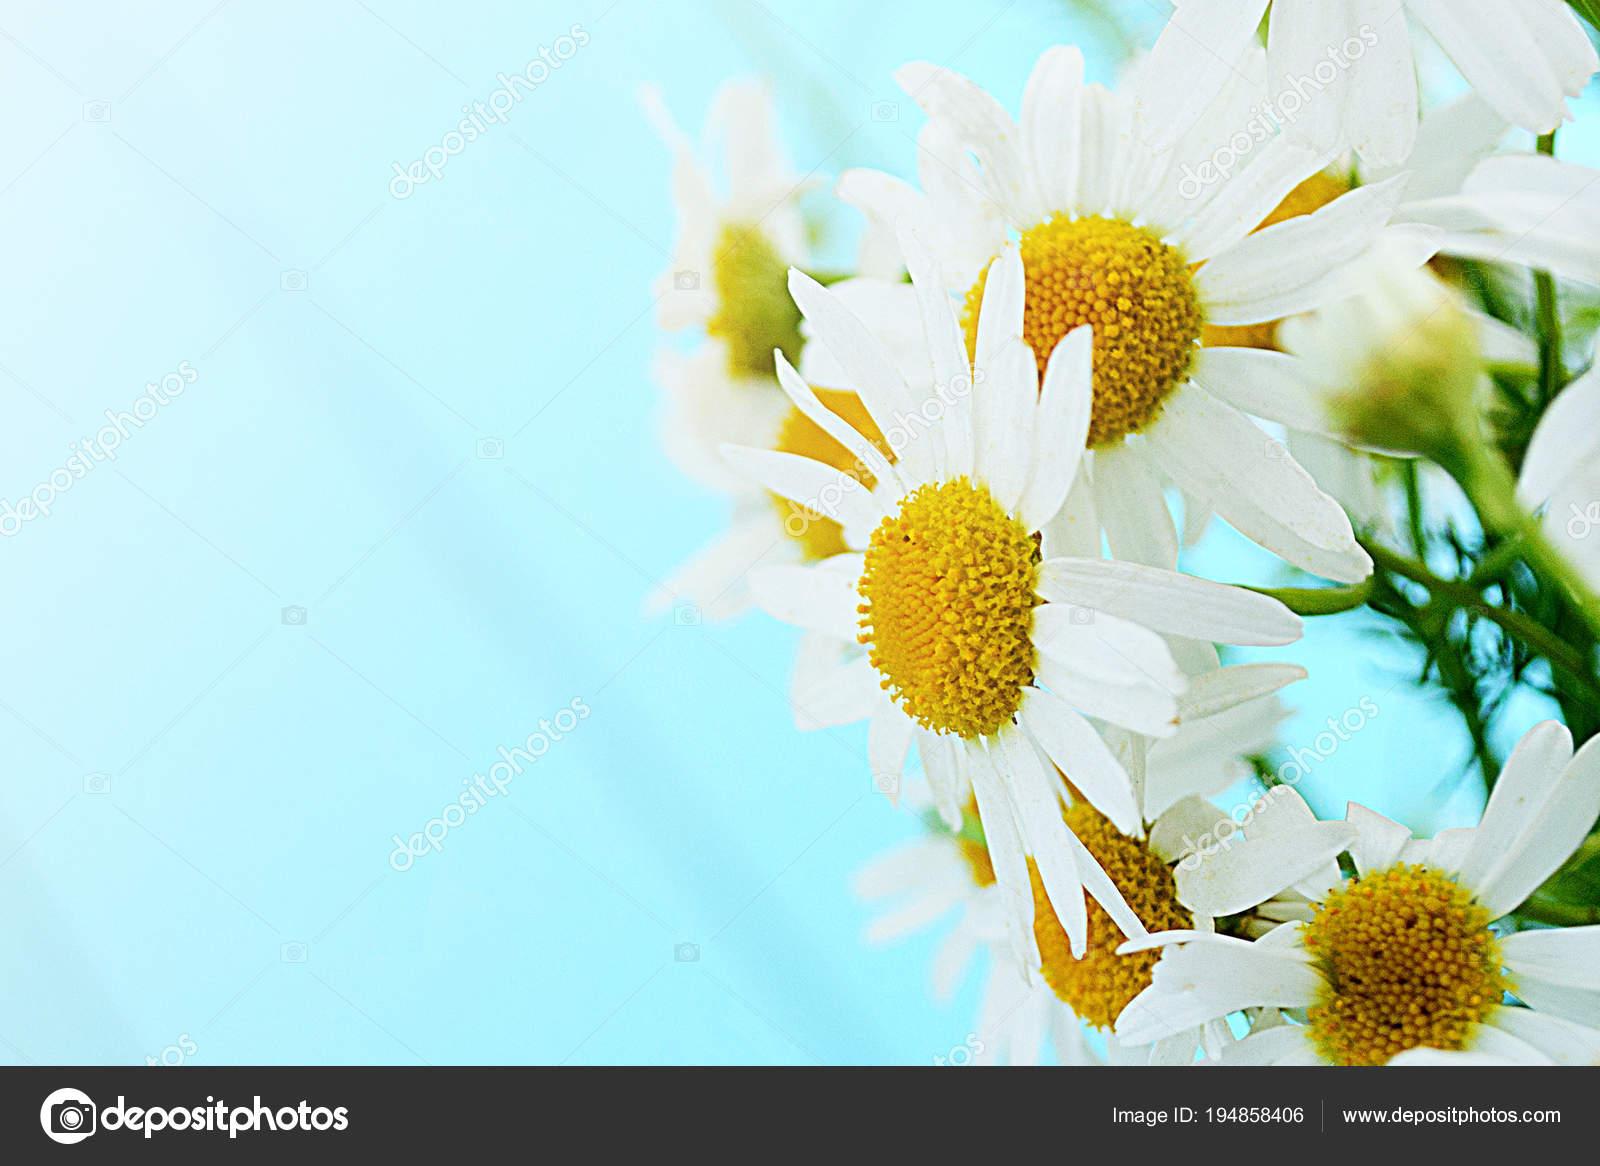 Spring delicate flowers daisies blue wooden background summer spring delicate flowers daisies blue wooden background summer background stock photo izmirmasajfo